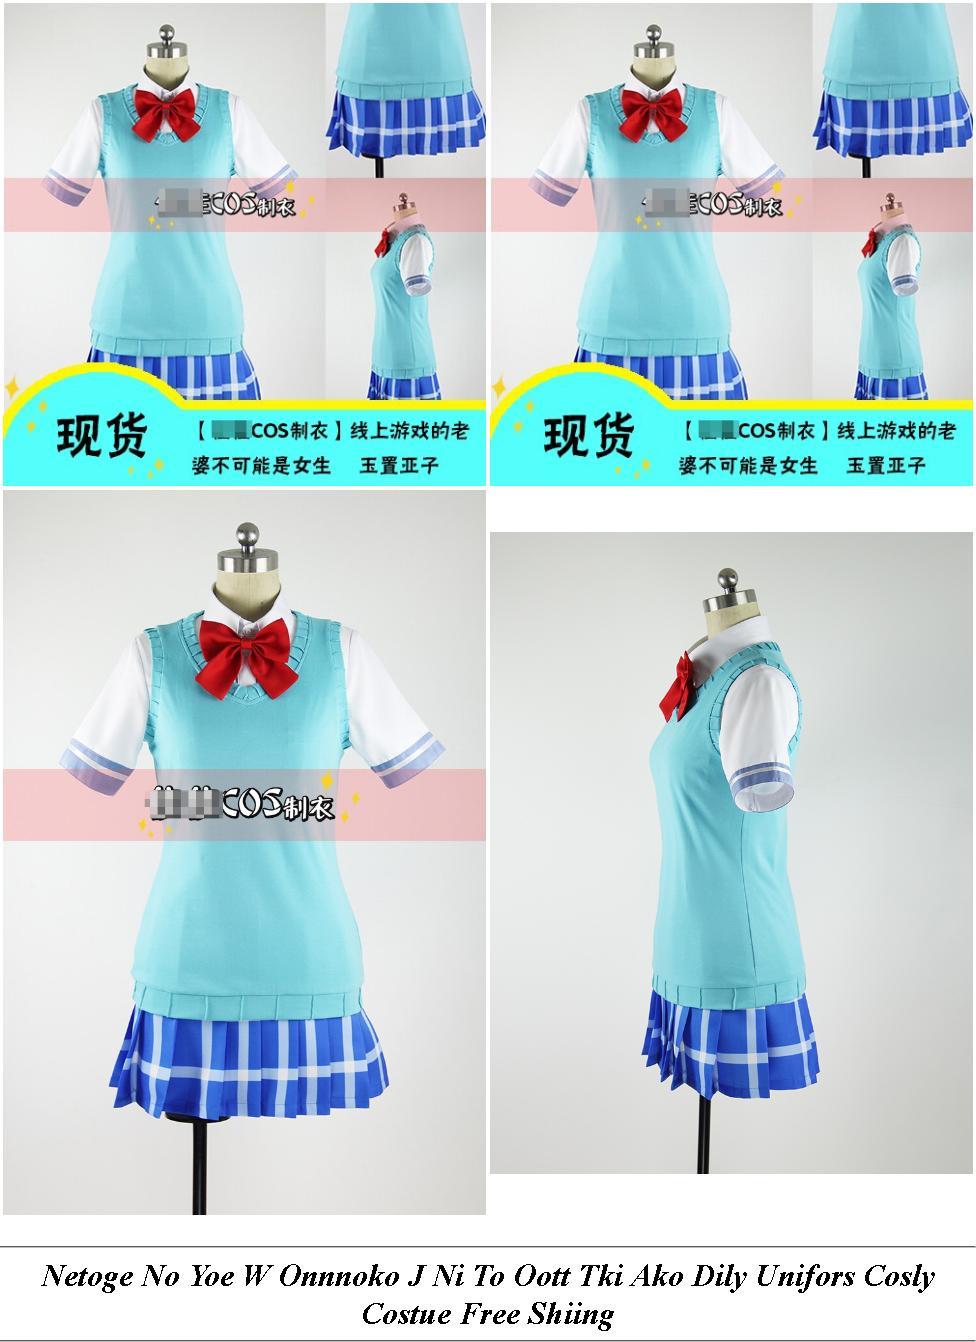 Summer Dresses For Women - Womens Clothes Sale Uk - Sheath Dress - Cheap Designer Clothes